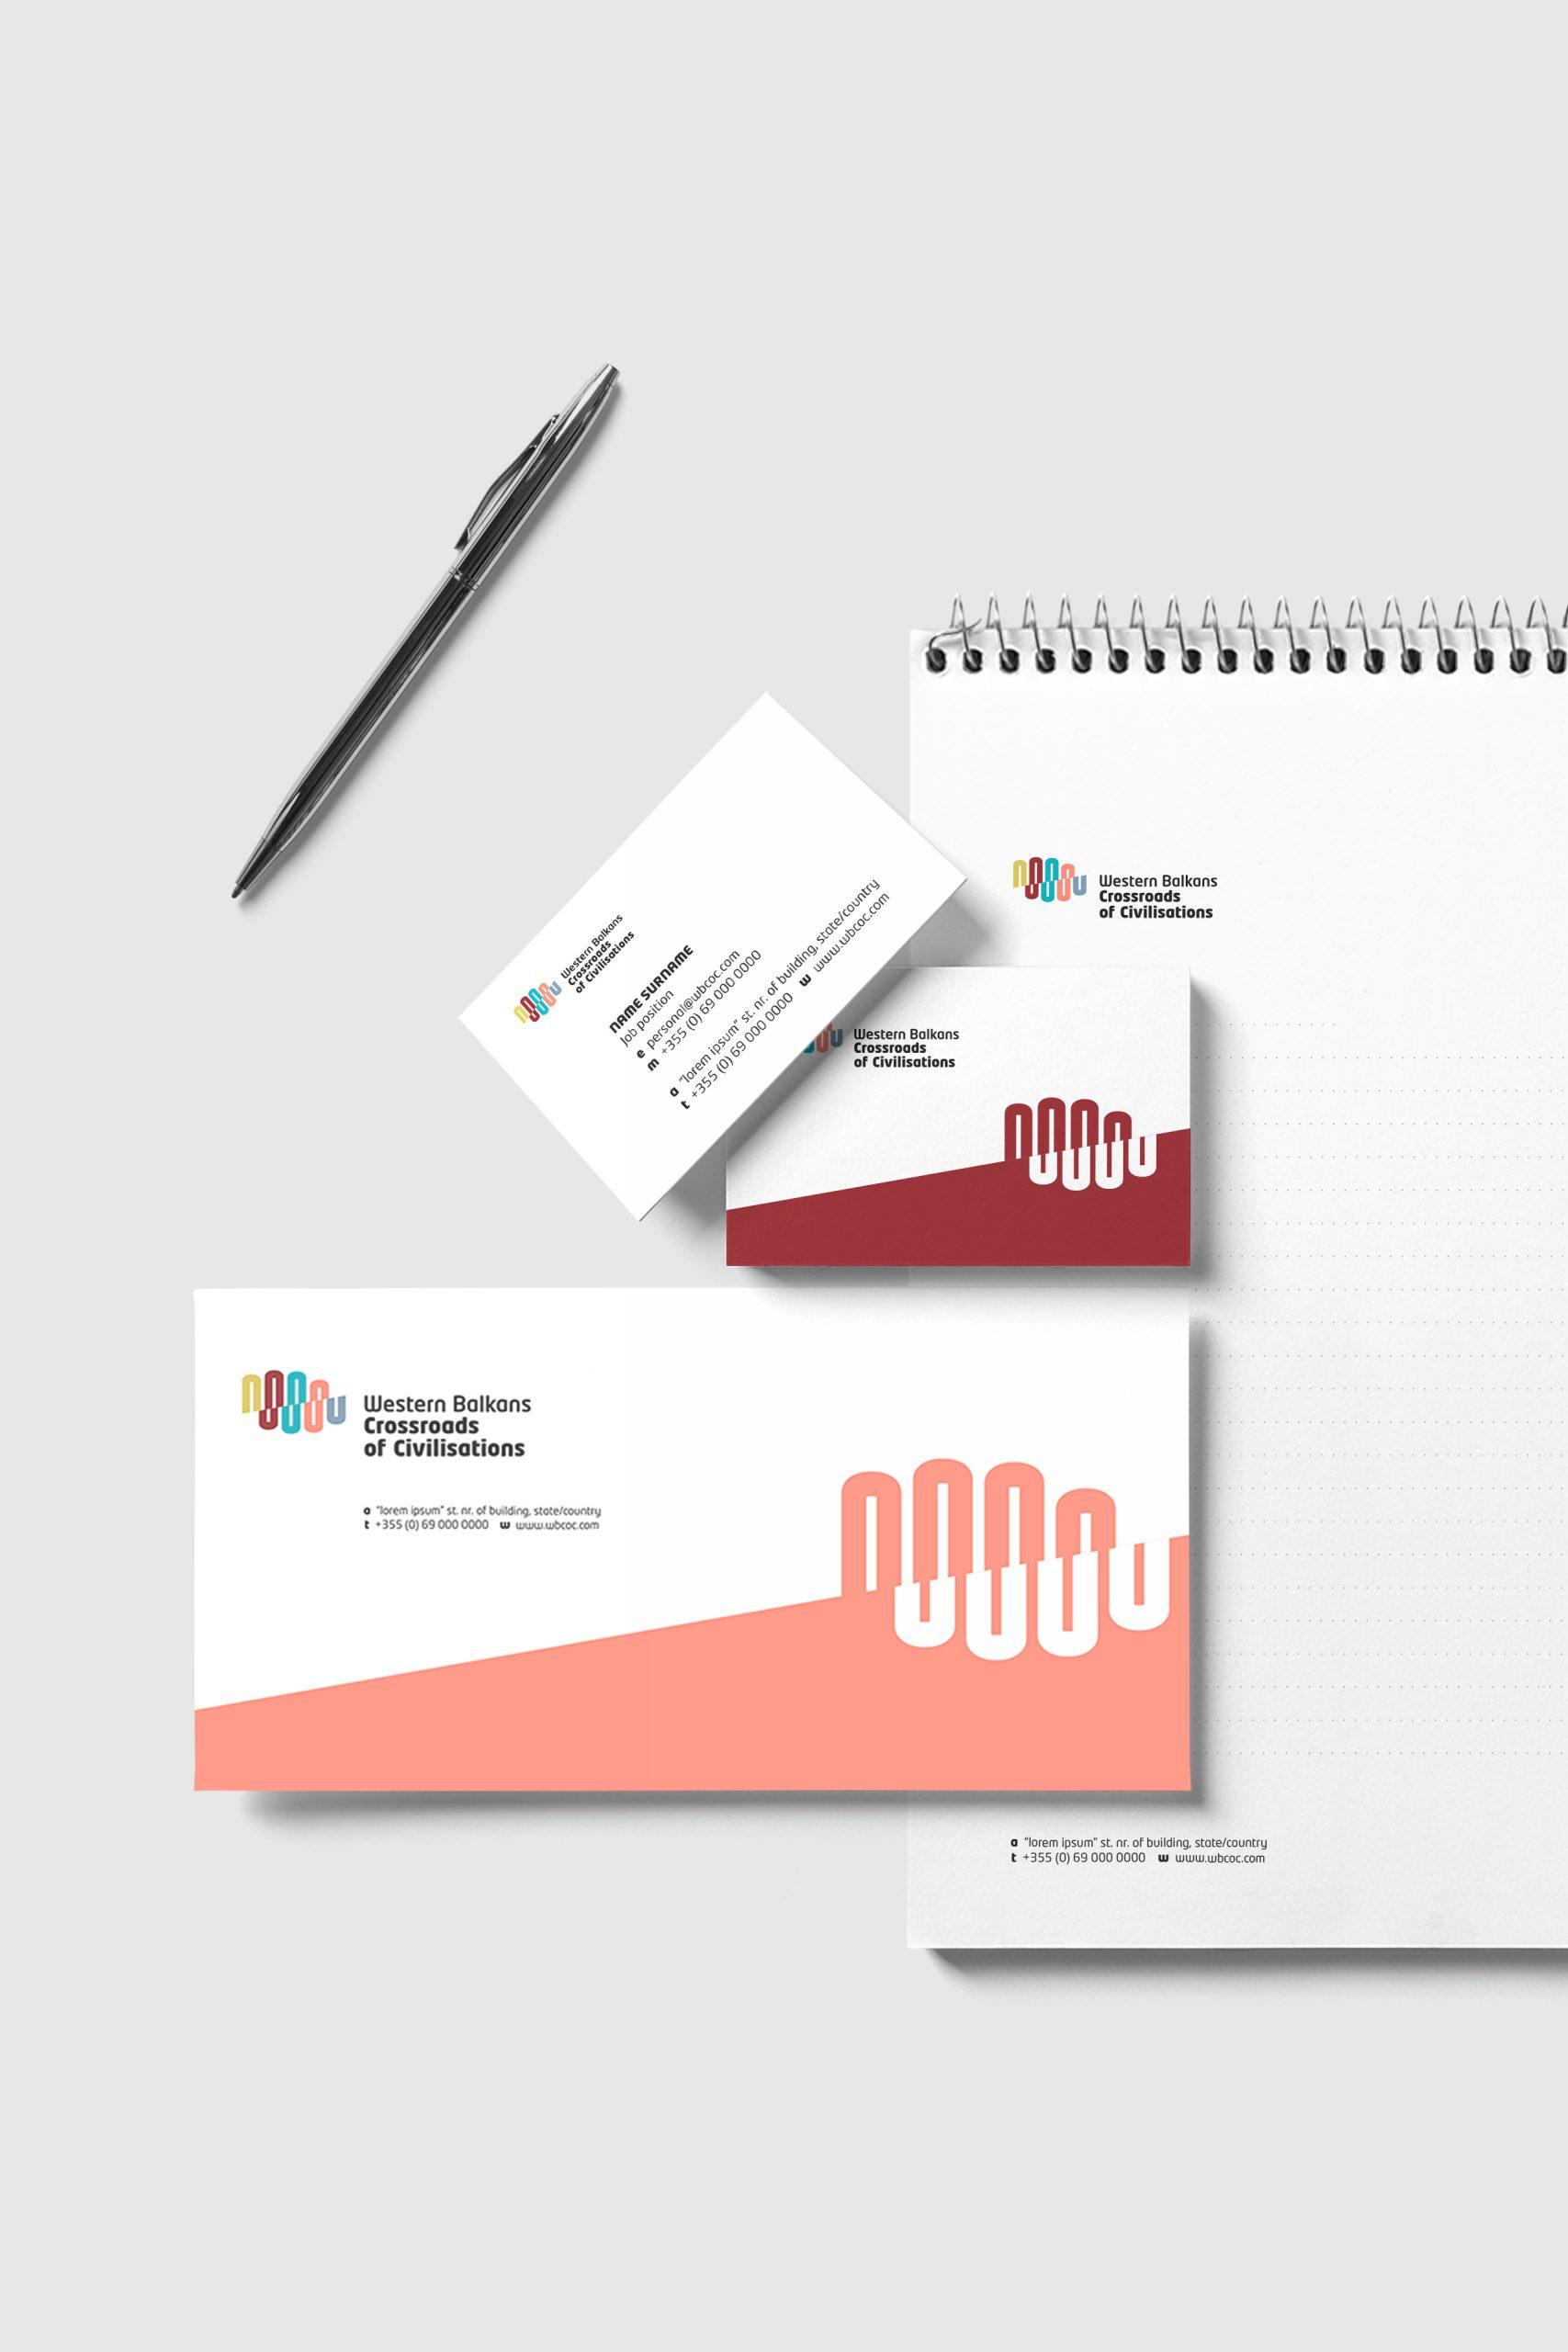 Western Balkans Crossroads of Civilisations, Project Img 10 - Vatra Agency / Founder & CEO Gerton Bejo